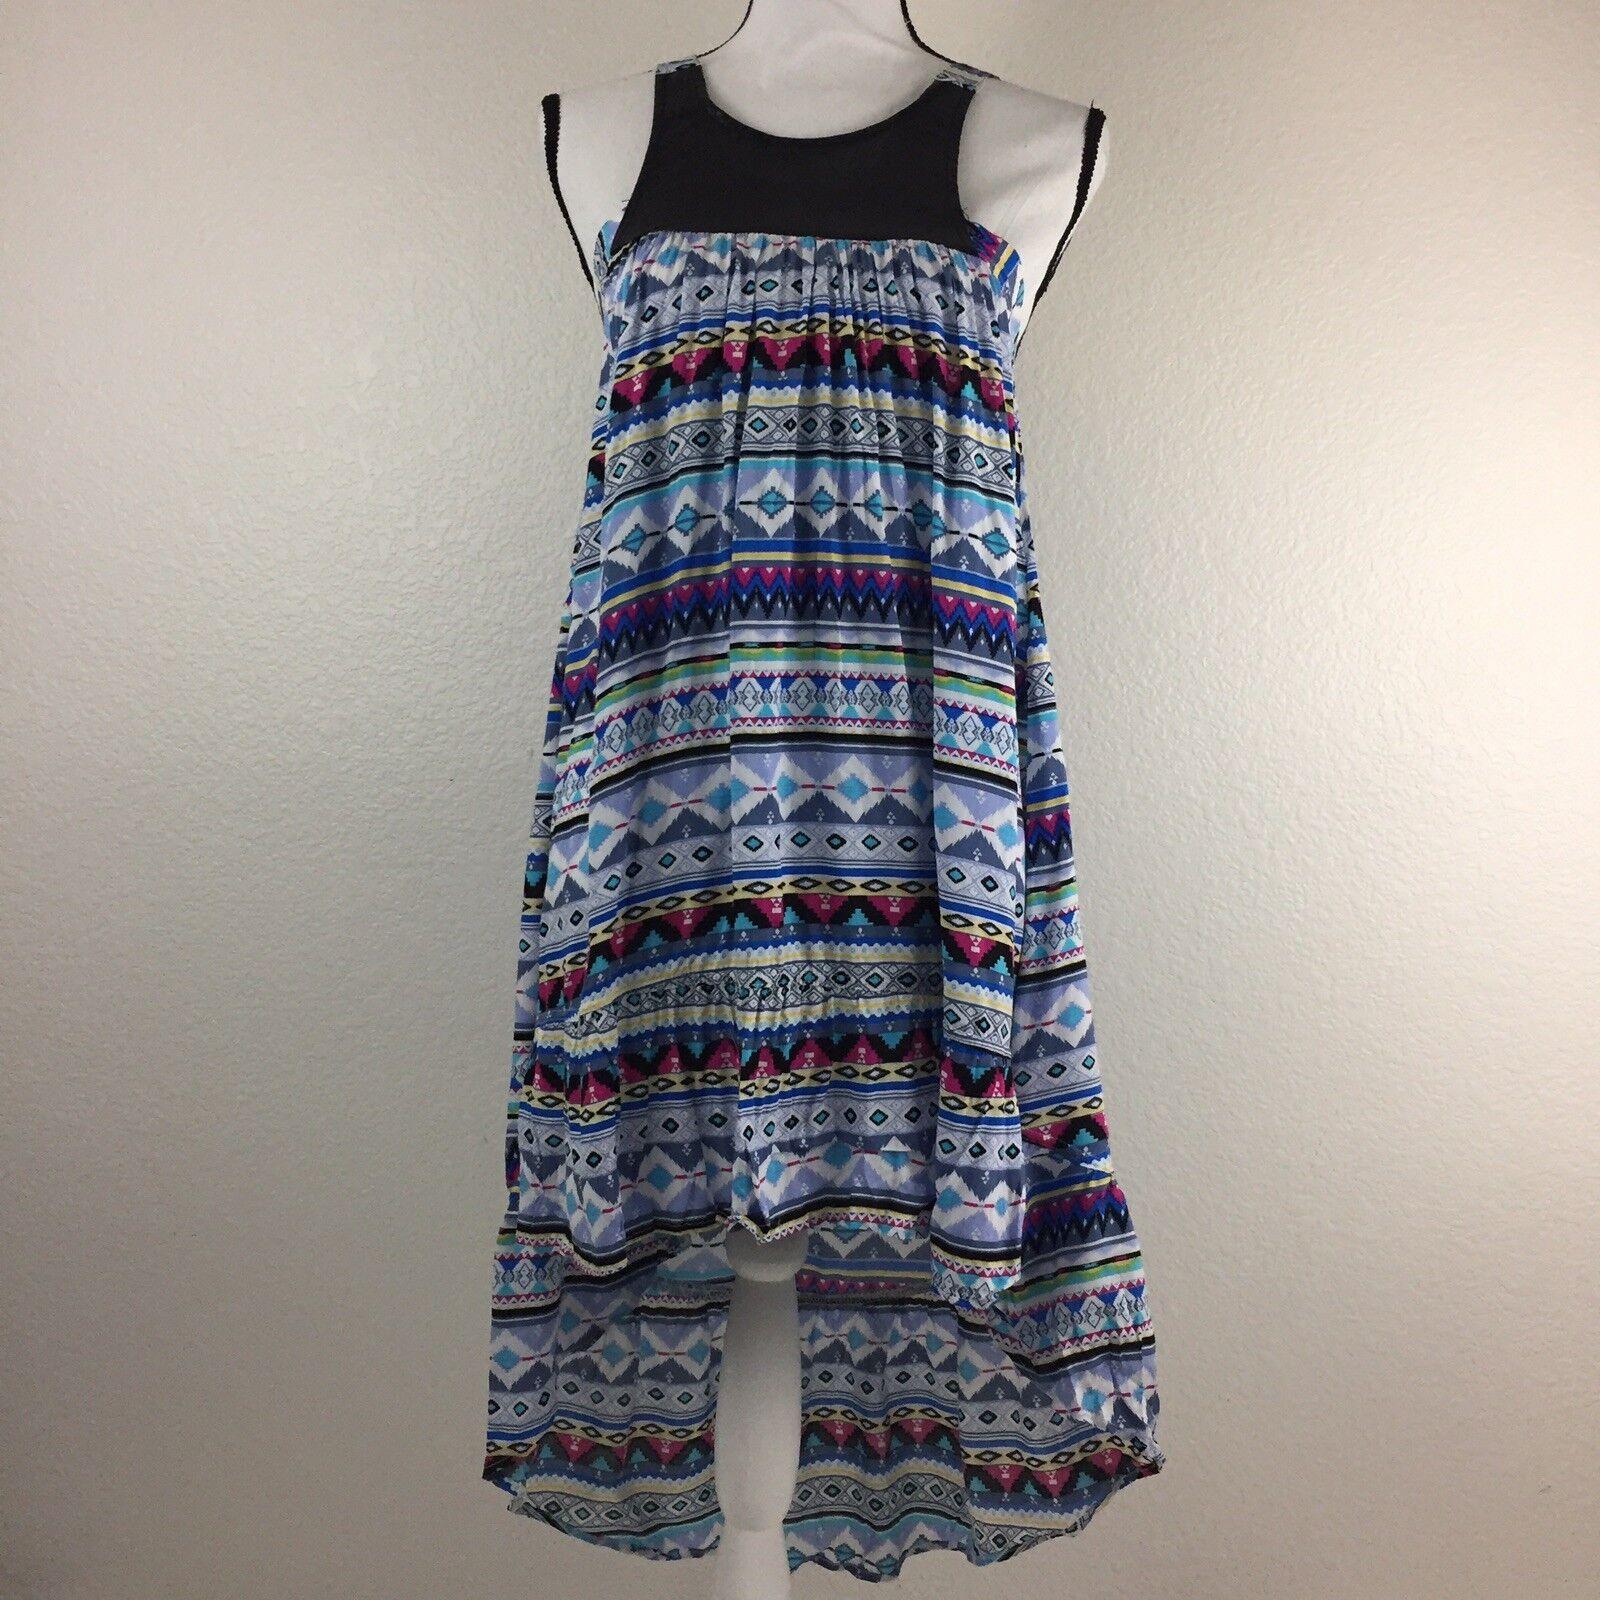 Lf Paper Heart Womens Size 8 High Low Sleeveless Dress. Z1